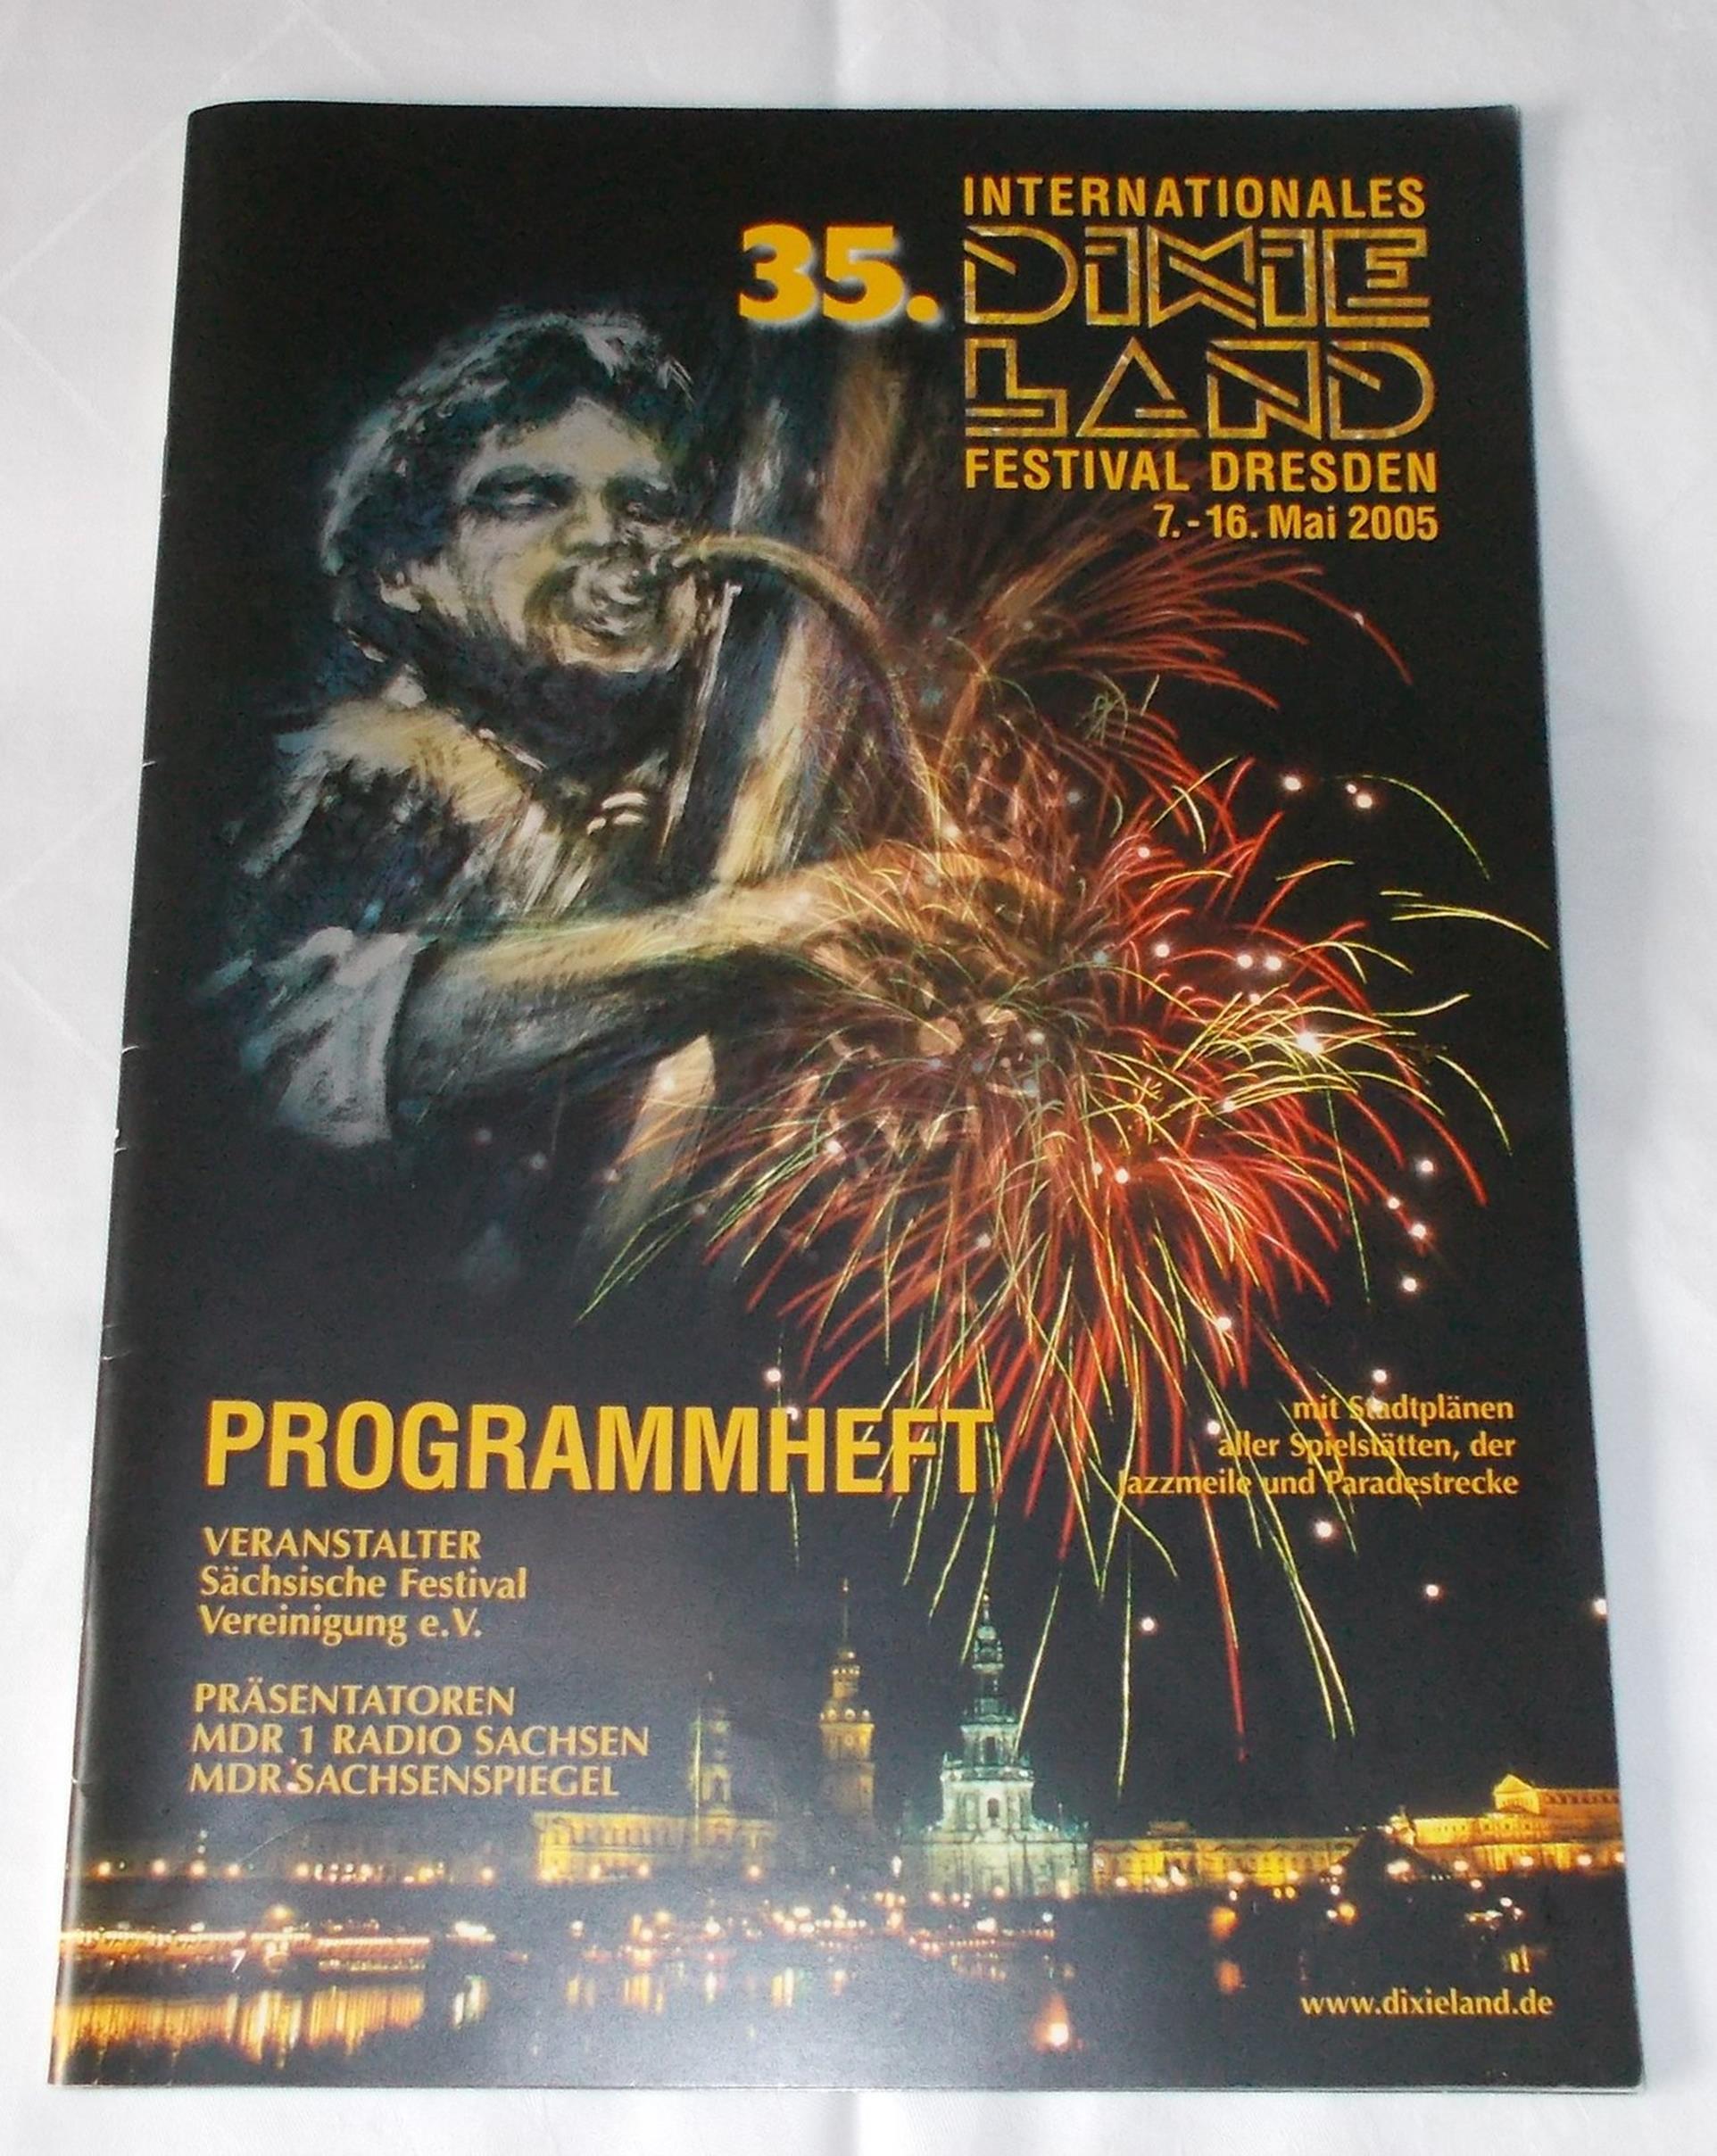 Programmheft 35. Internationales Dixieland Festival Dresden 7.-16. Mai 2005